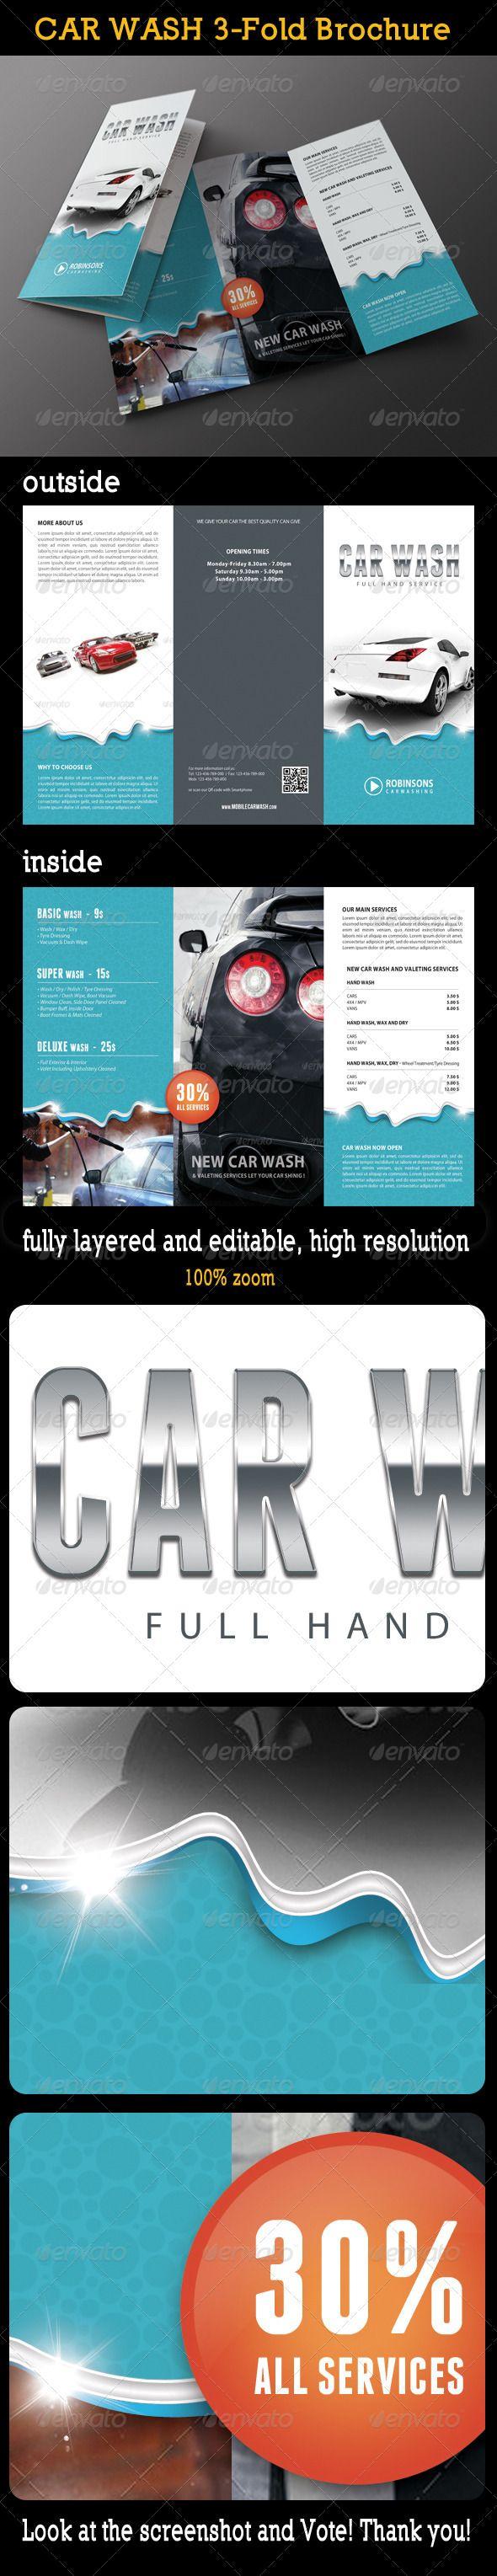 Car Wash Fold Brochure   Brochure Template Car Wash And